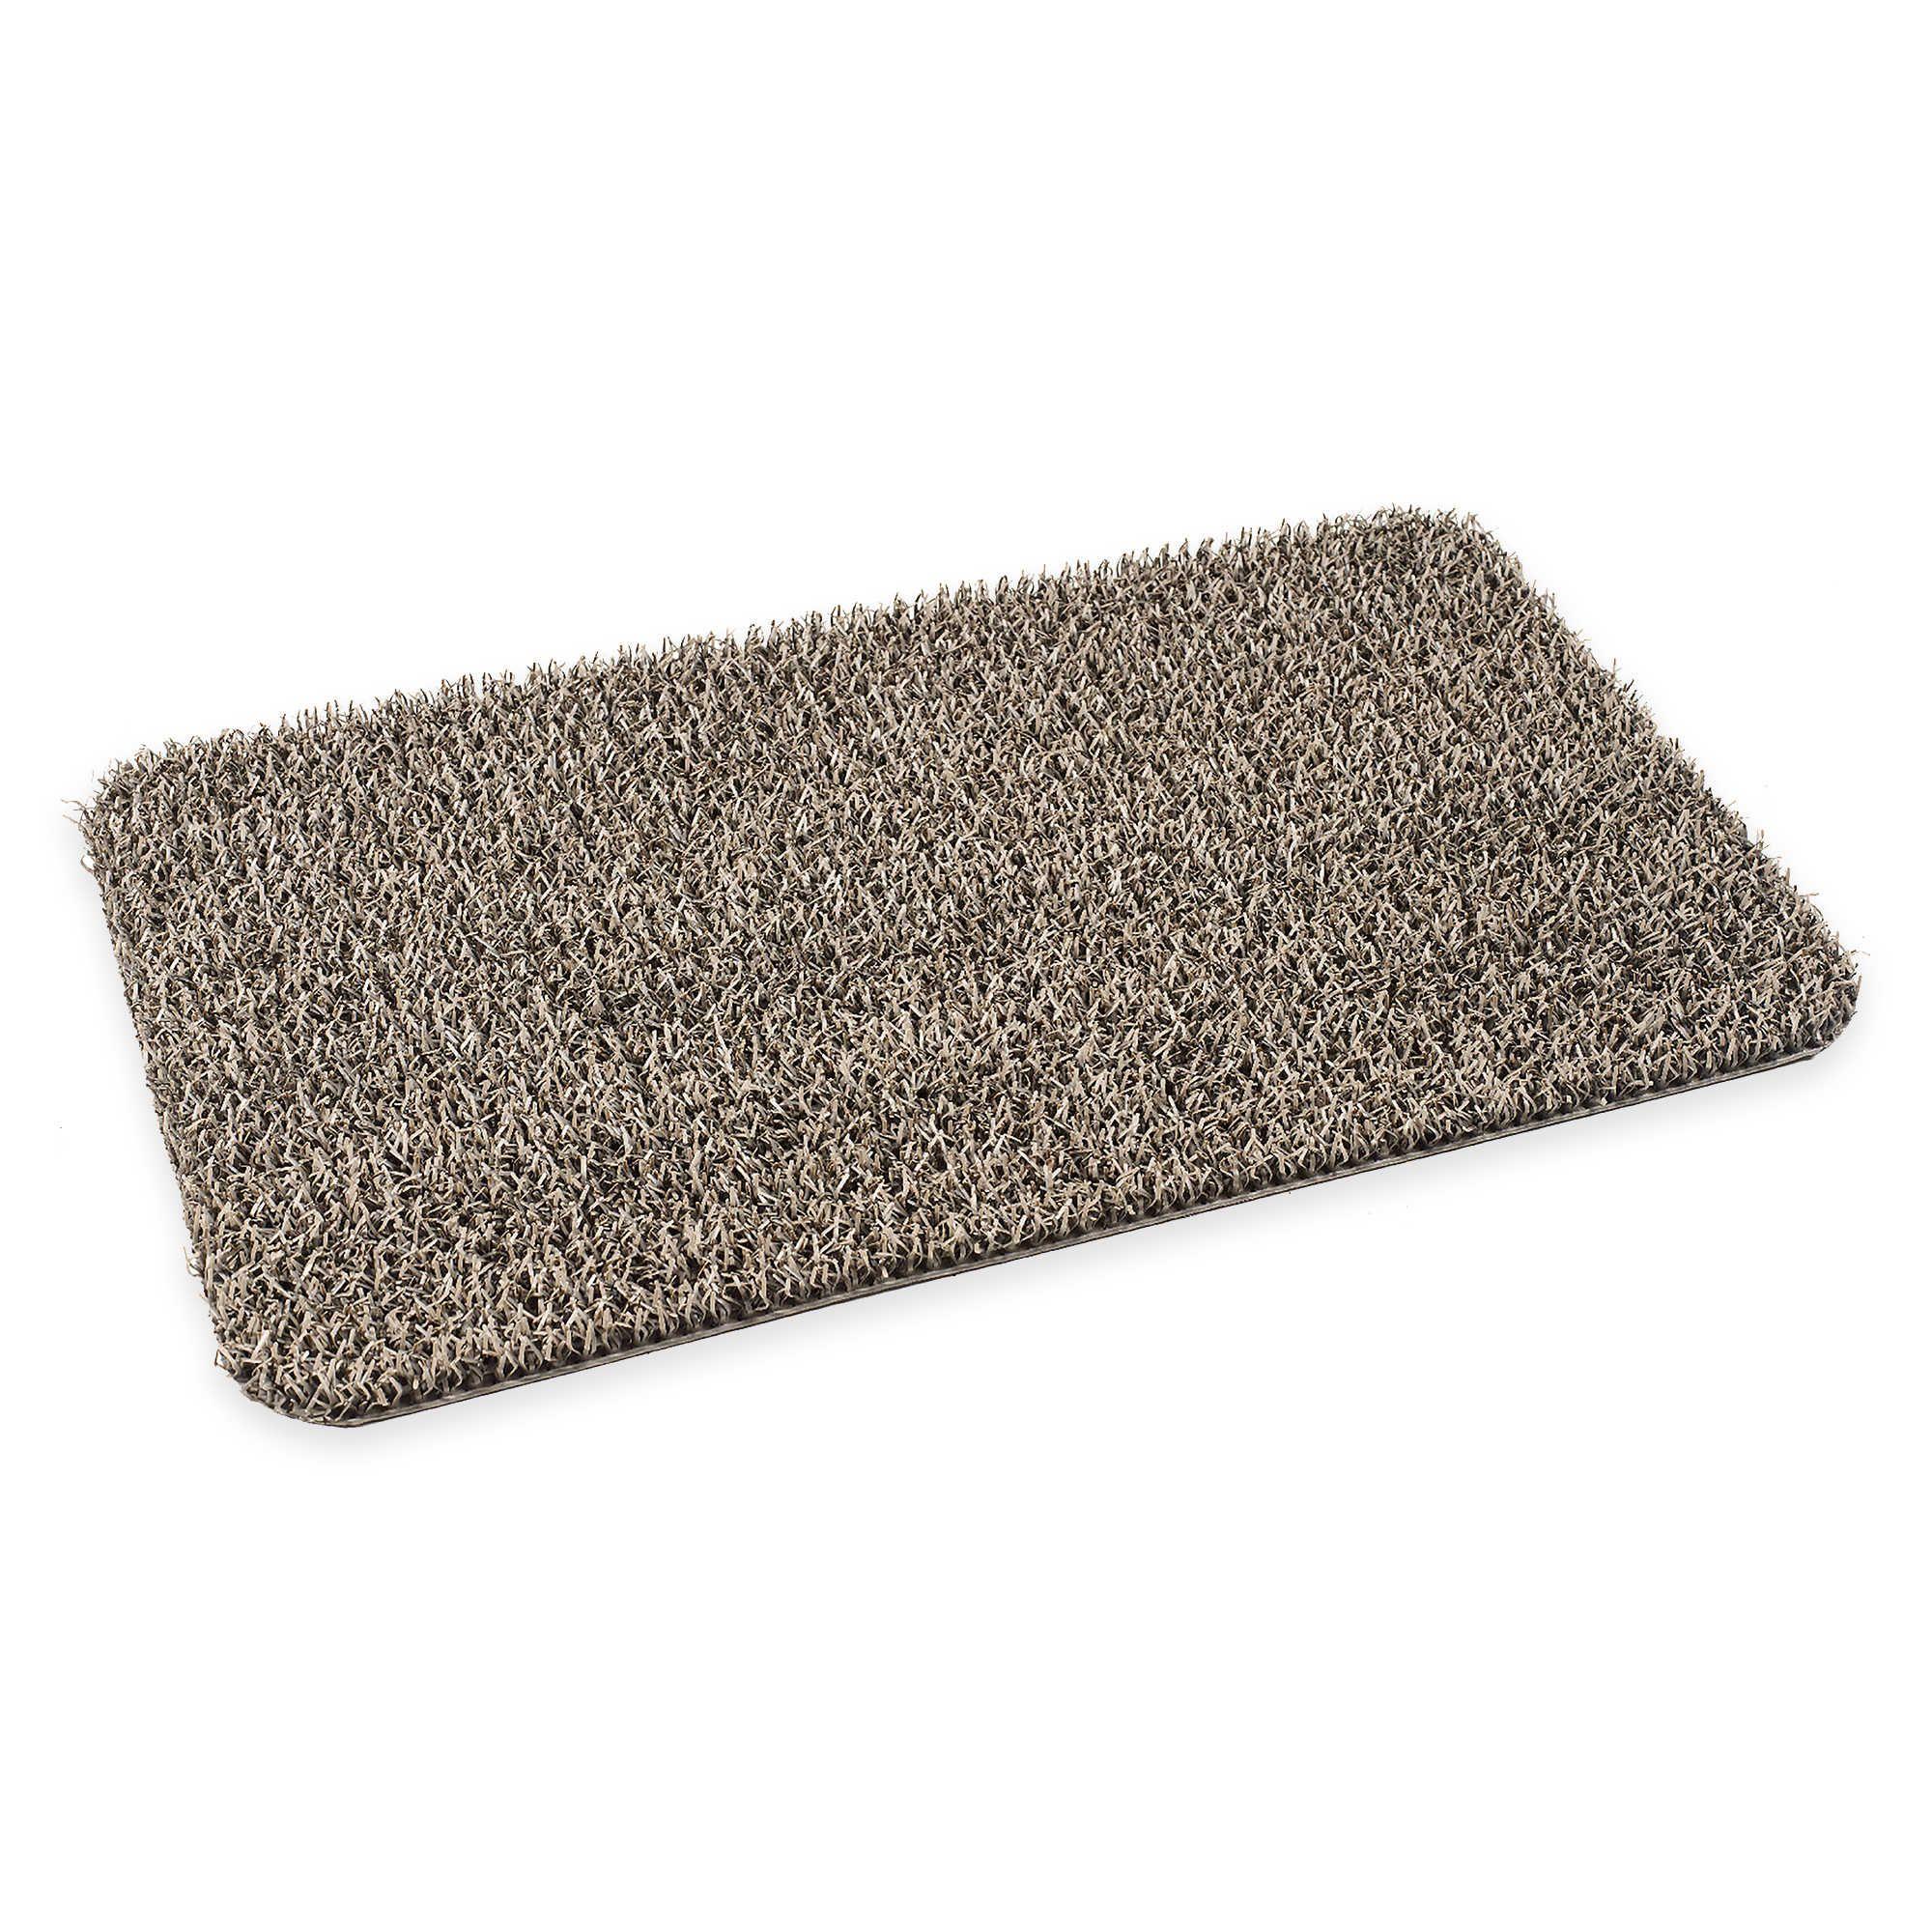 18 Inch X 30 Inch Medium Flair Earth Door Mat In Taupe Door Mat Bedding Shop Bed Bath And Beyond